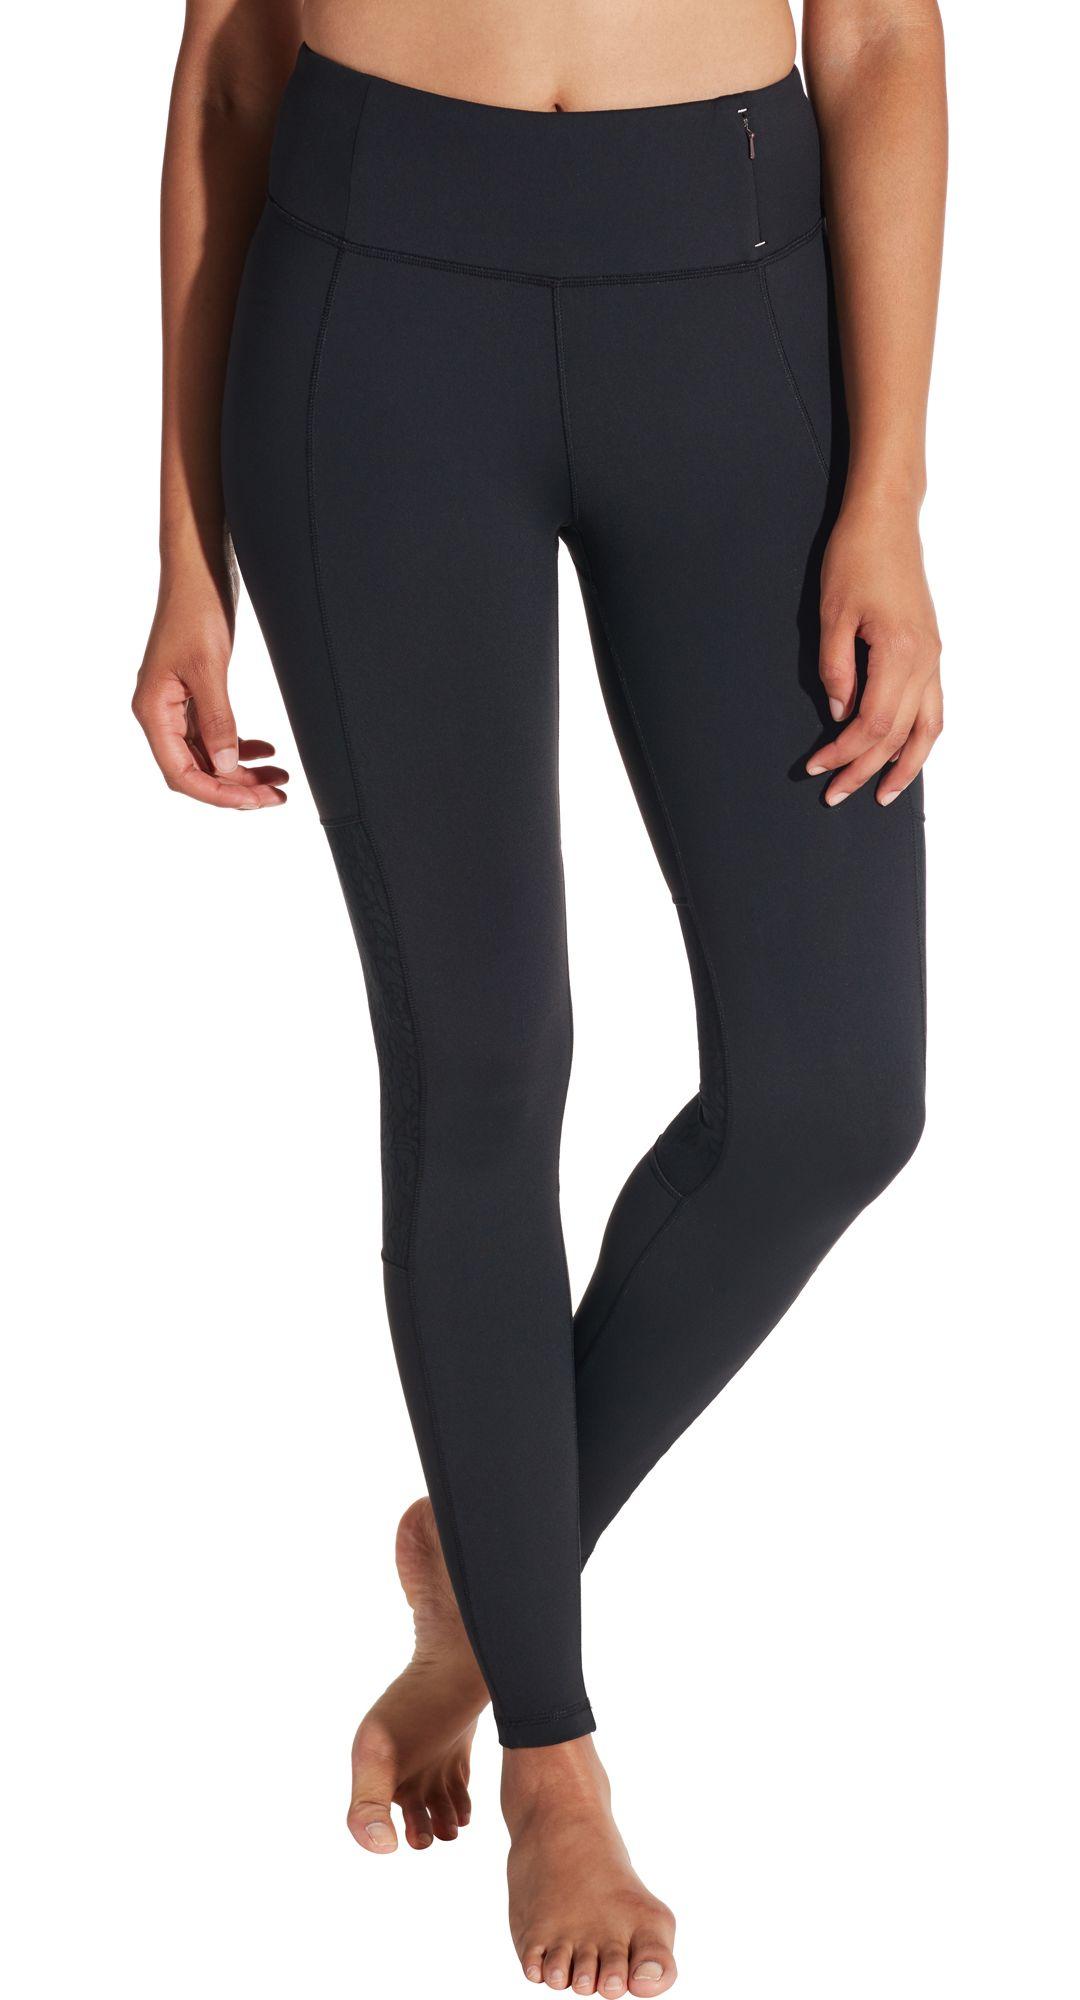 9ea89ee19a24de CALIA by Carrie Underwood Women's Mesh Back Leggings. noImageFound. Previous